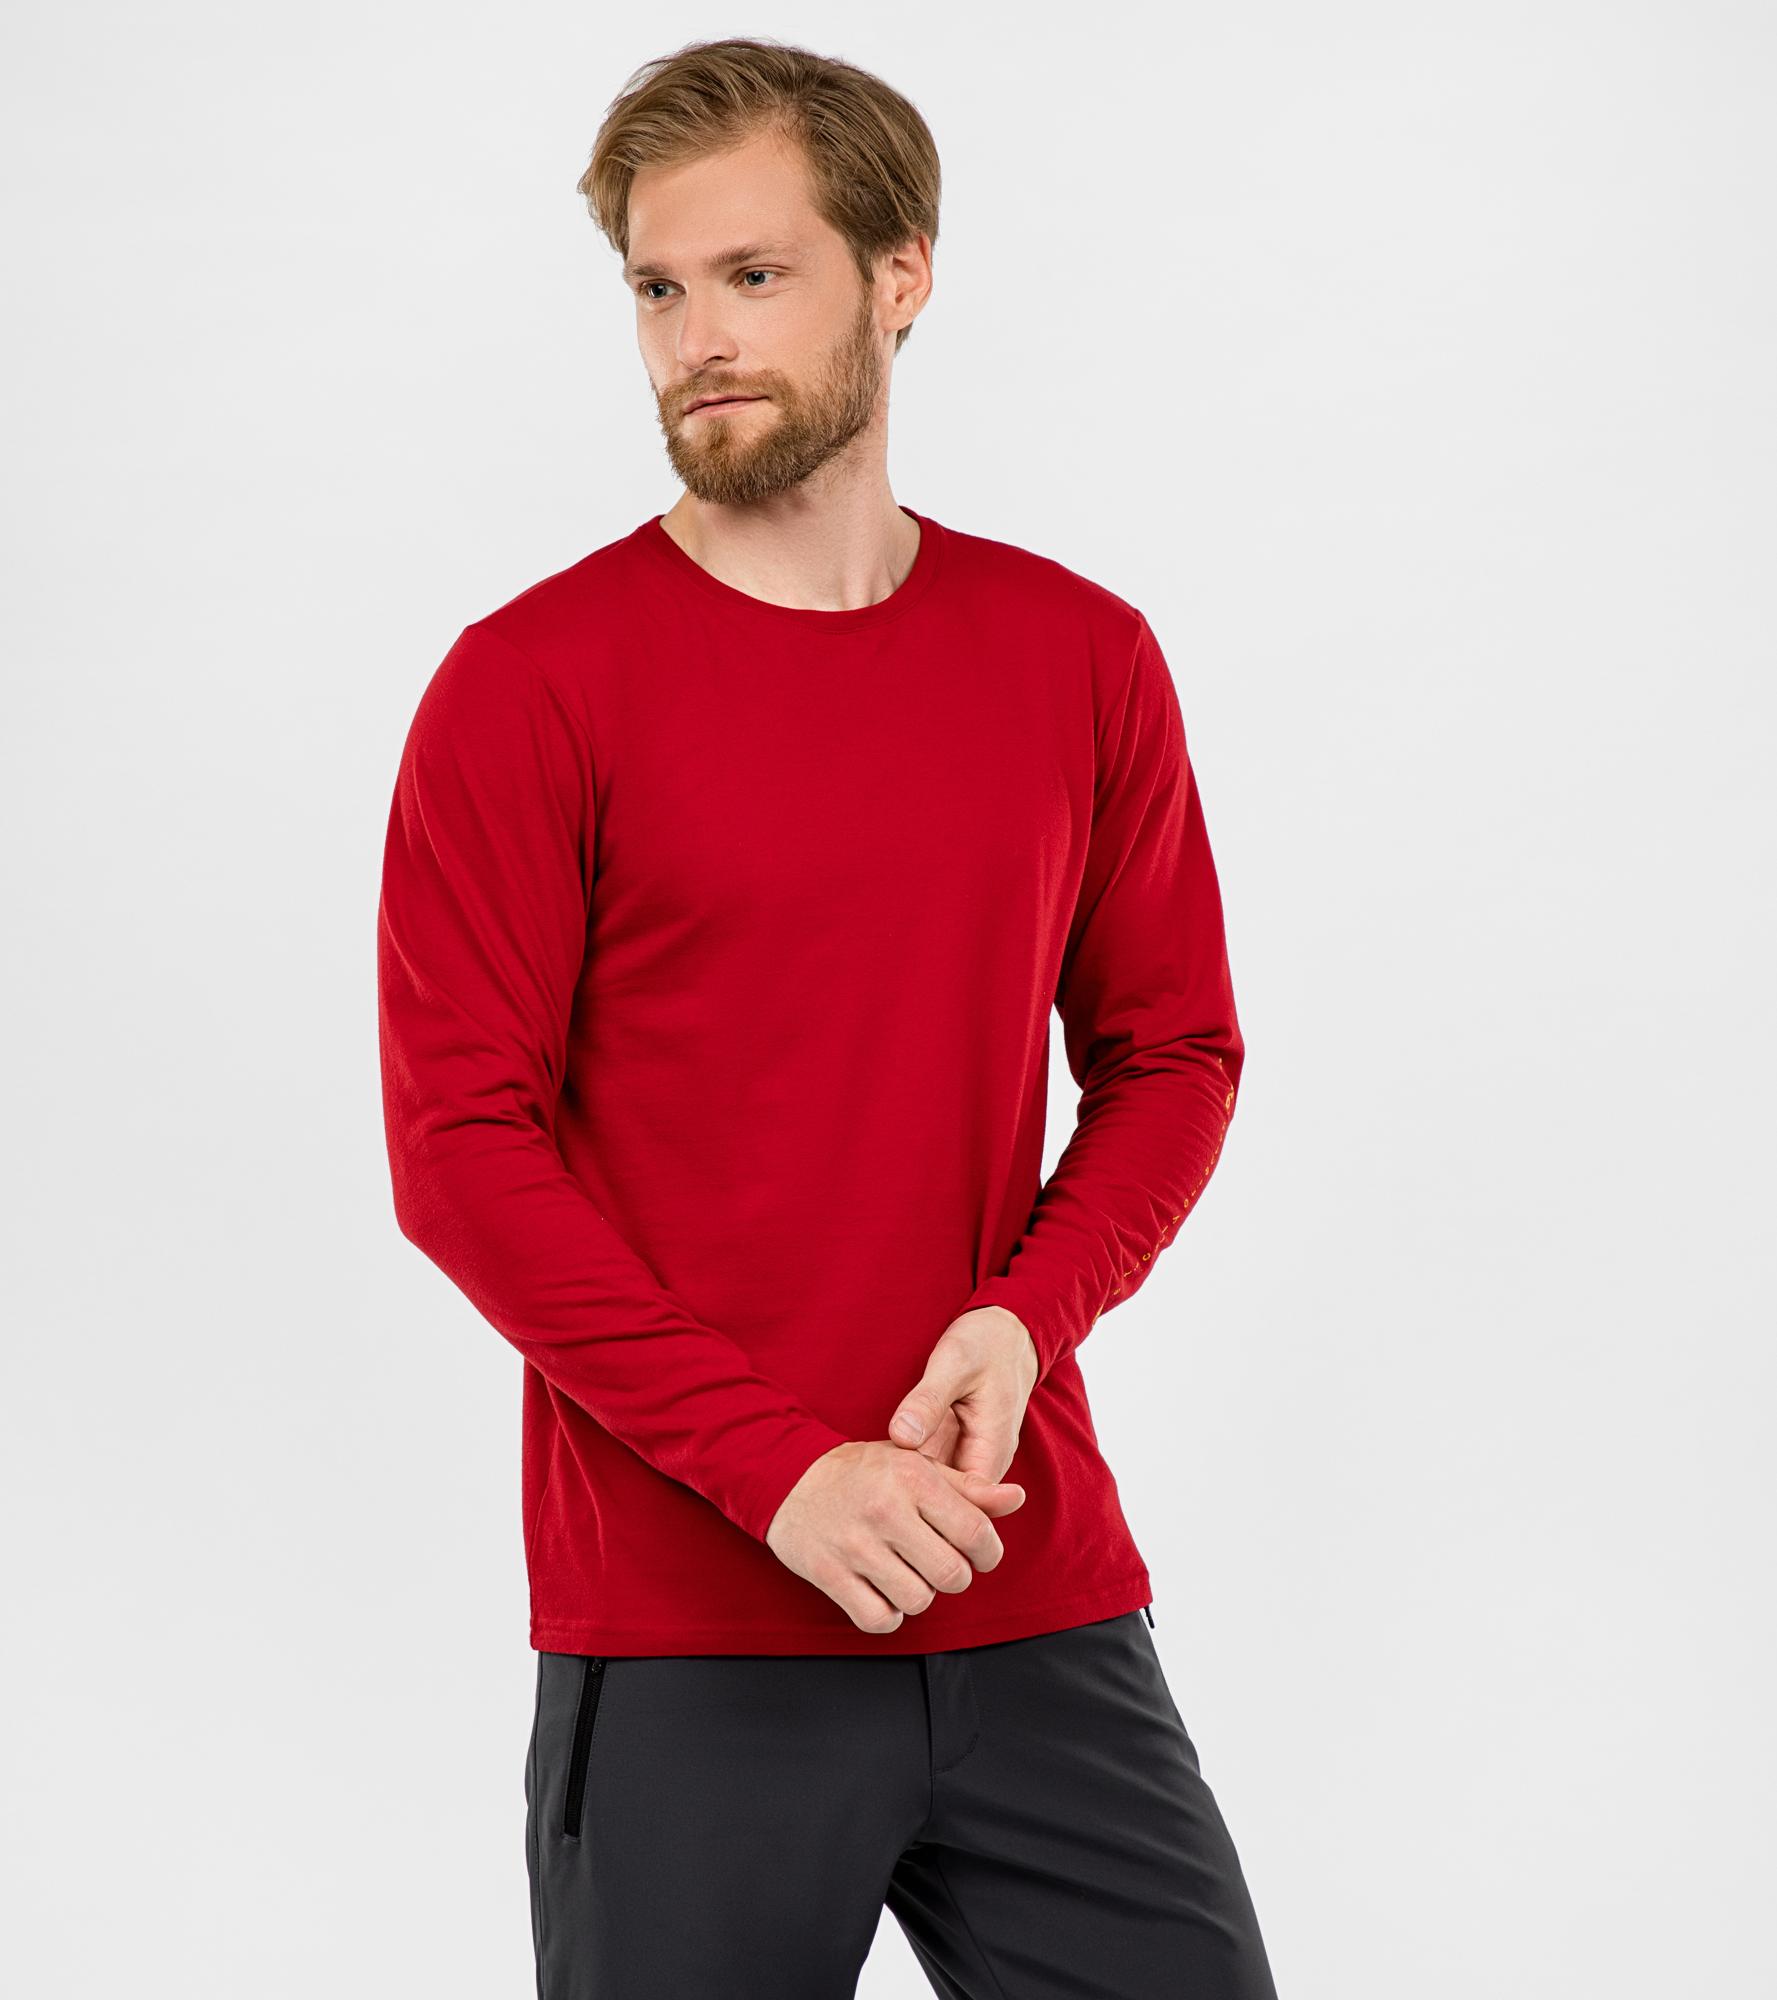 Mountain Hardwear Лонгслив мужской Mountain Hardwear Vertical Oriented™, размер 56 недорого